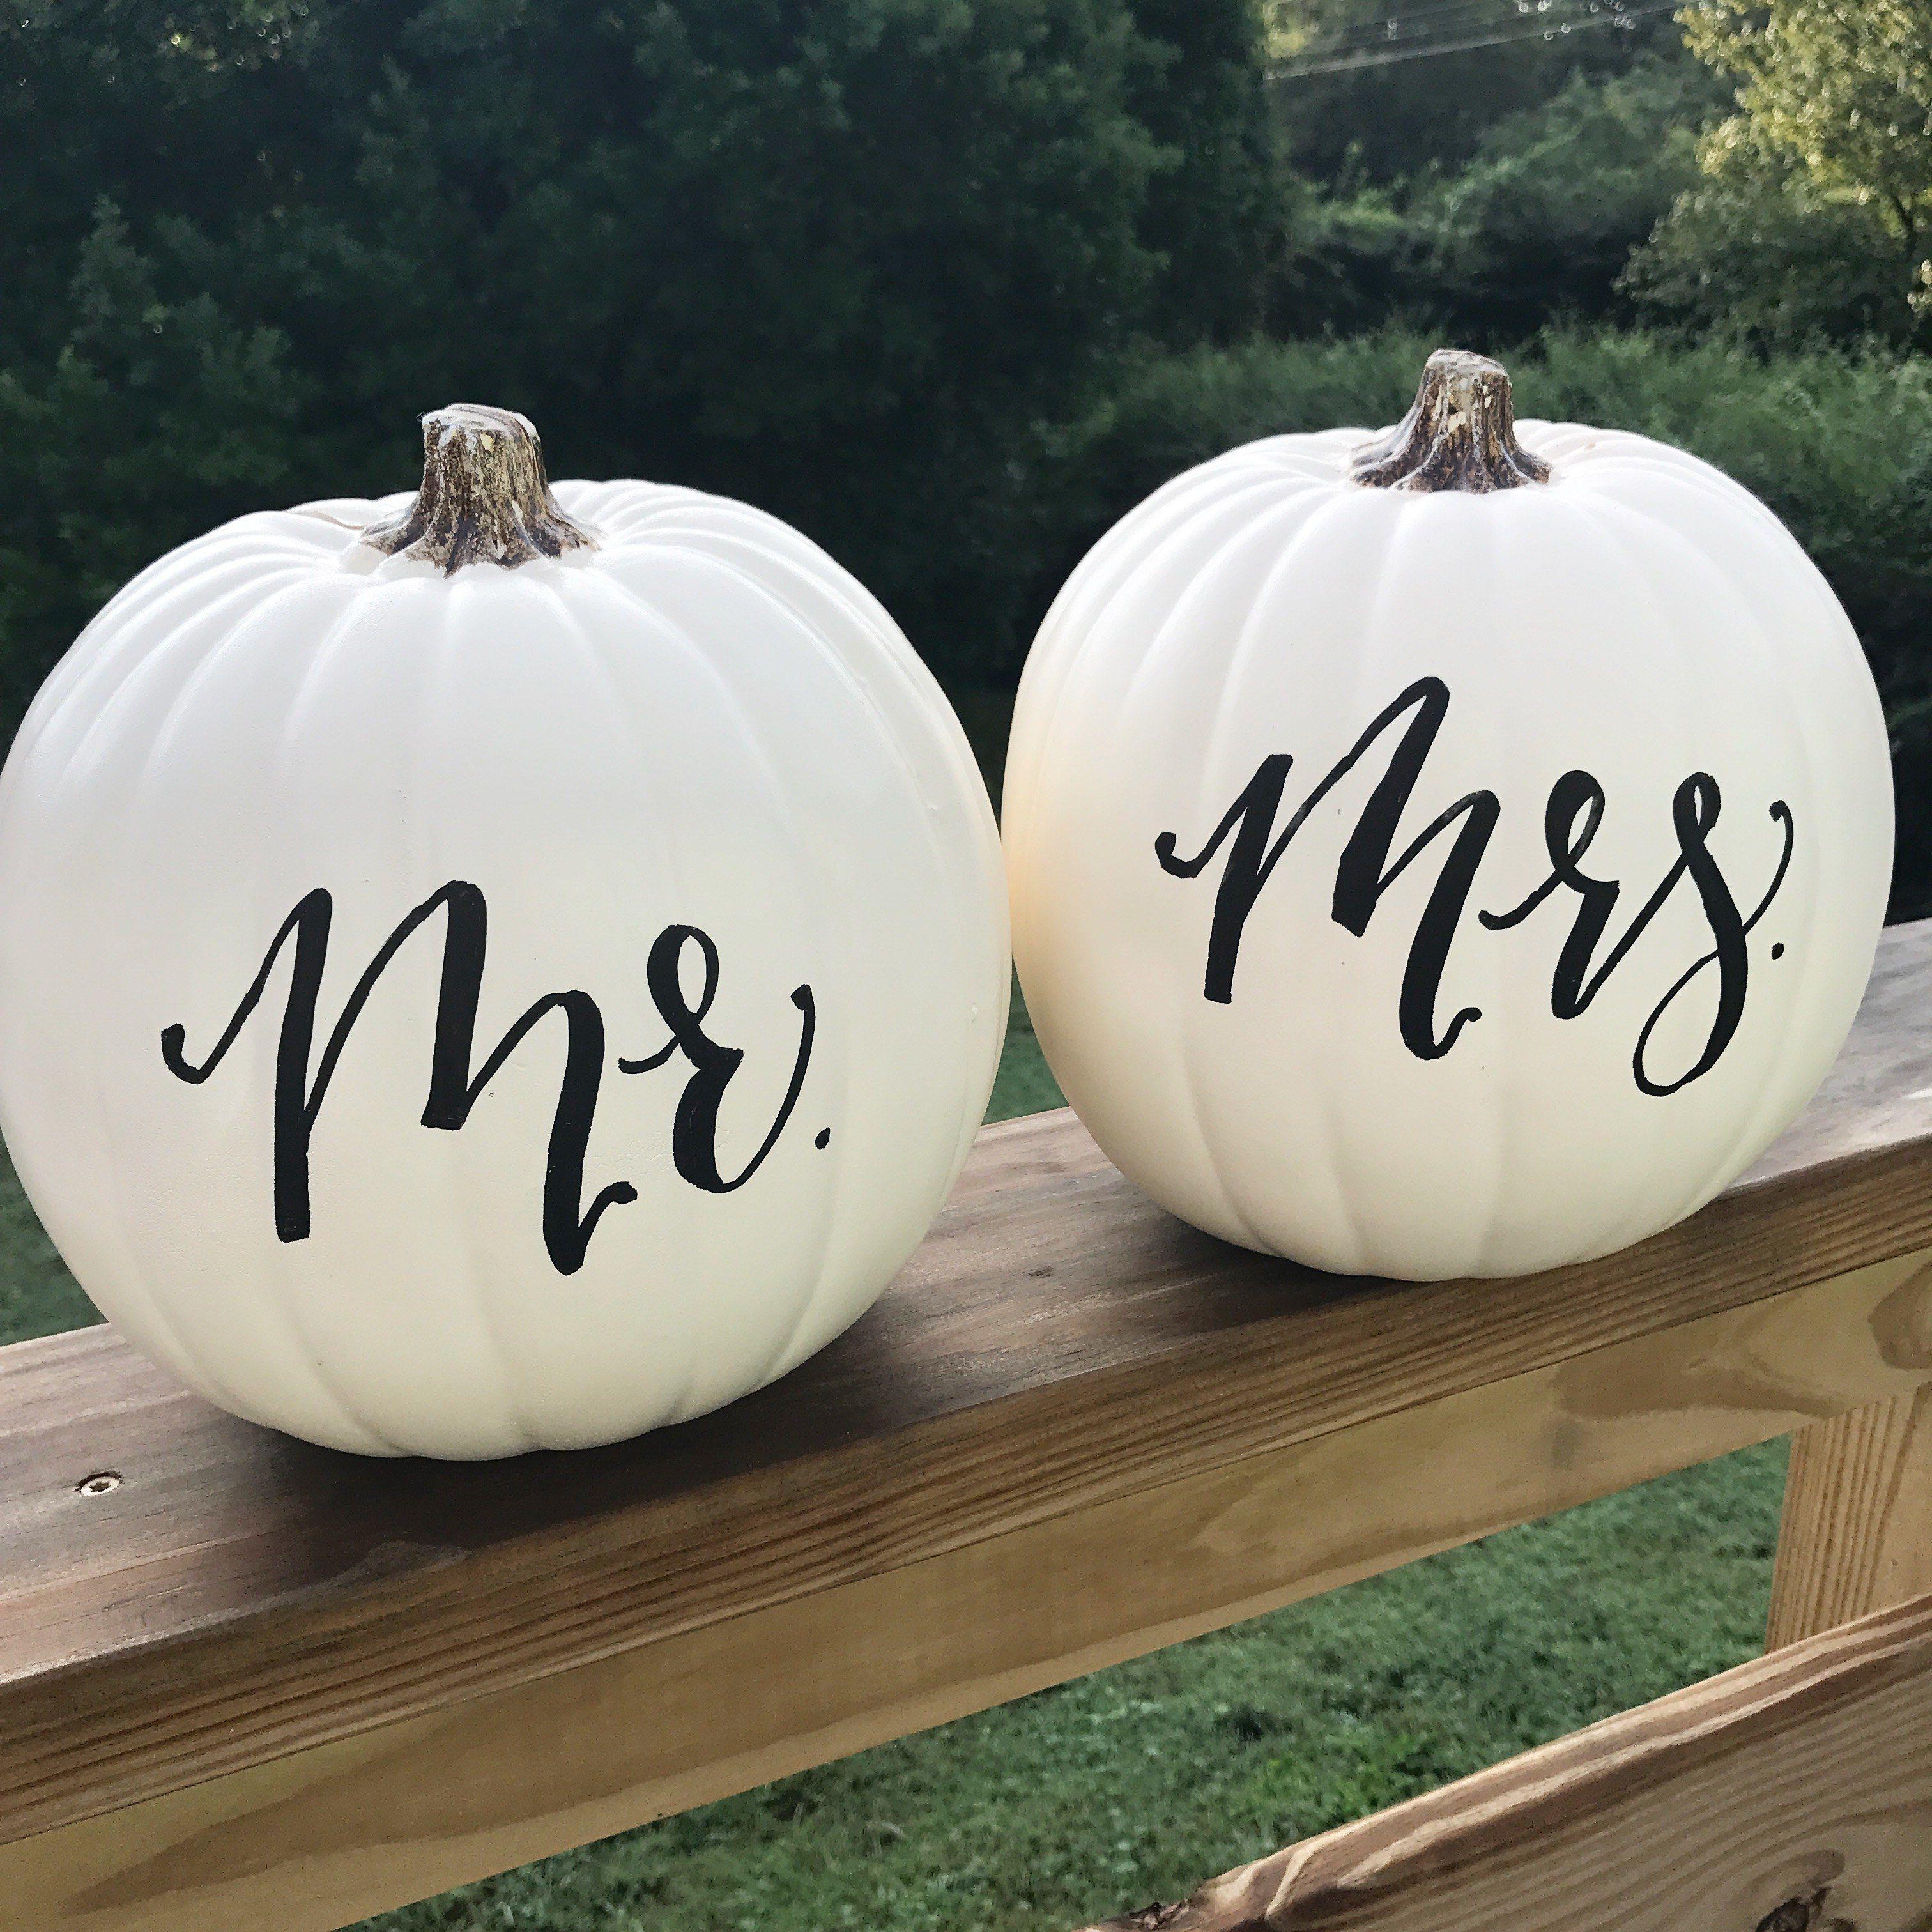 13 Fall Wedding Ideas With Pumpkin Decorations (That Aren\'t Basic ...